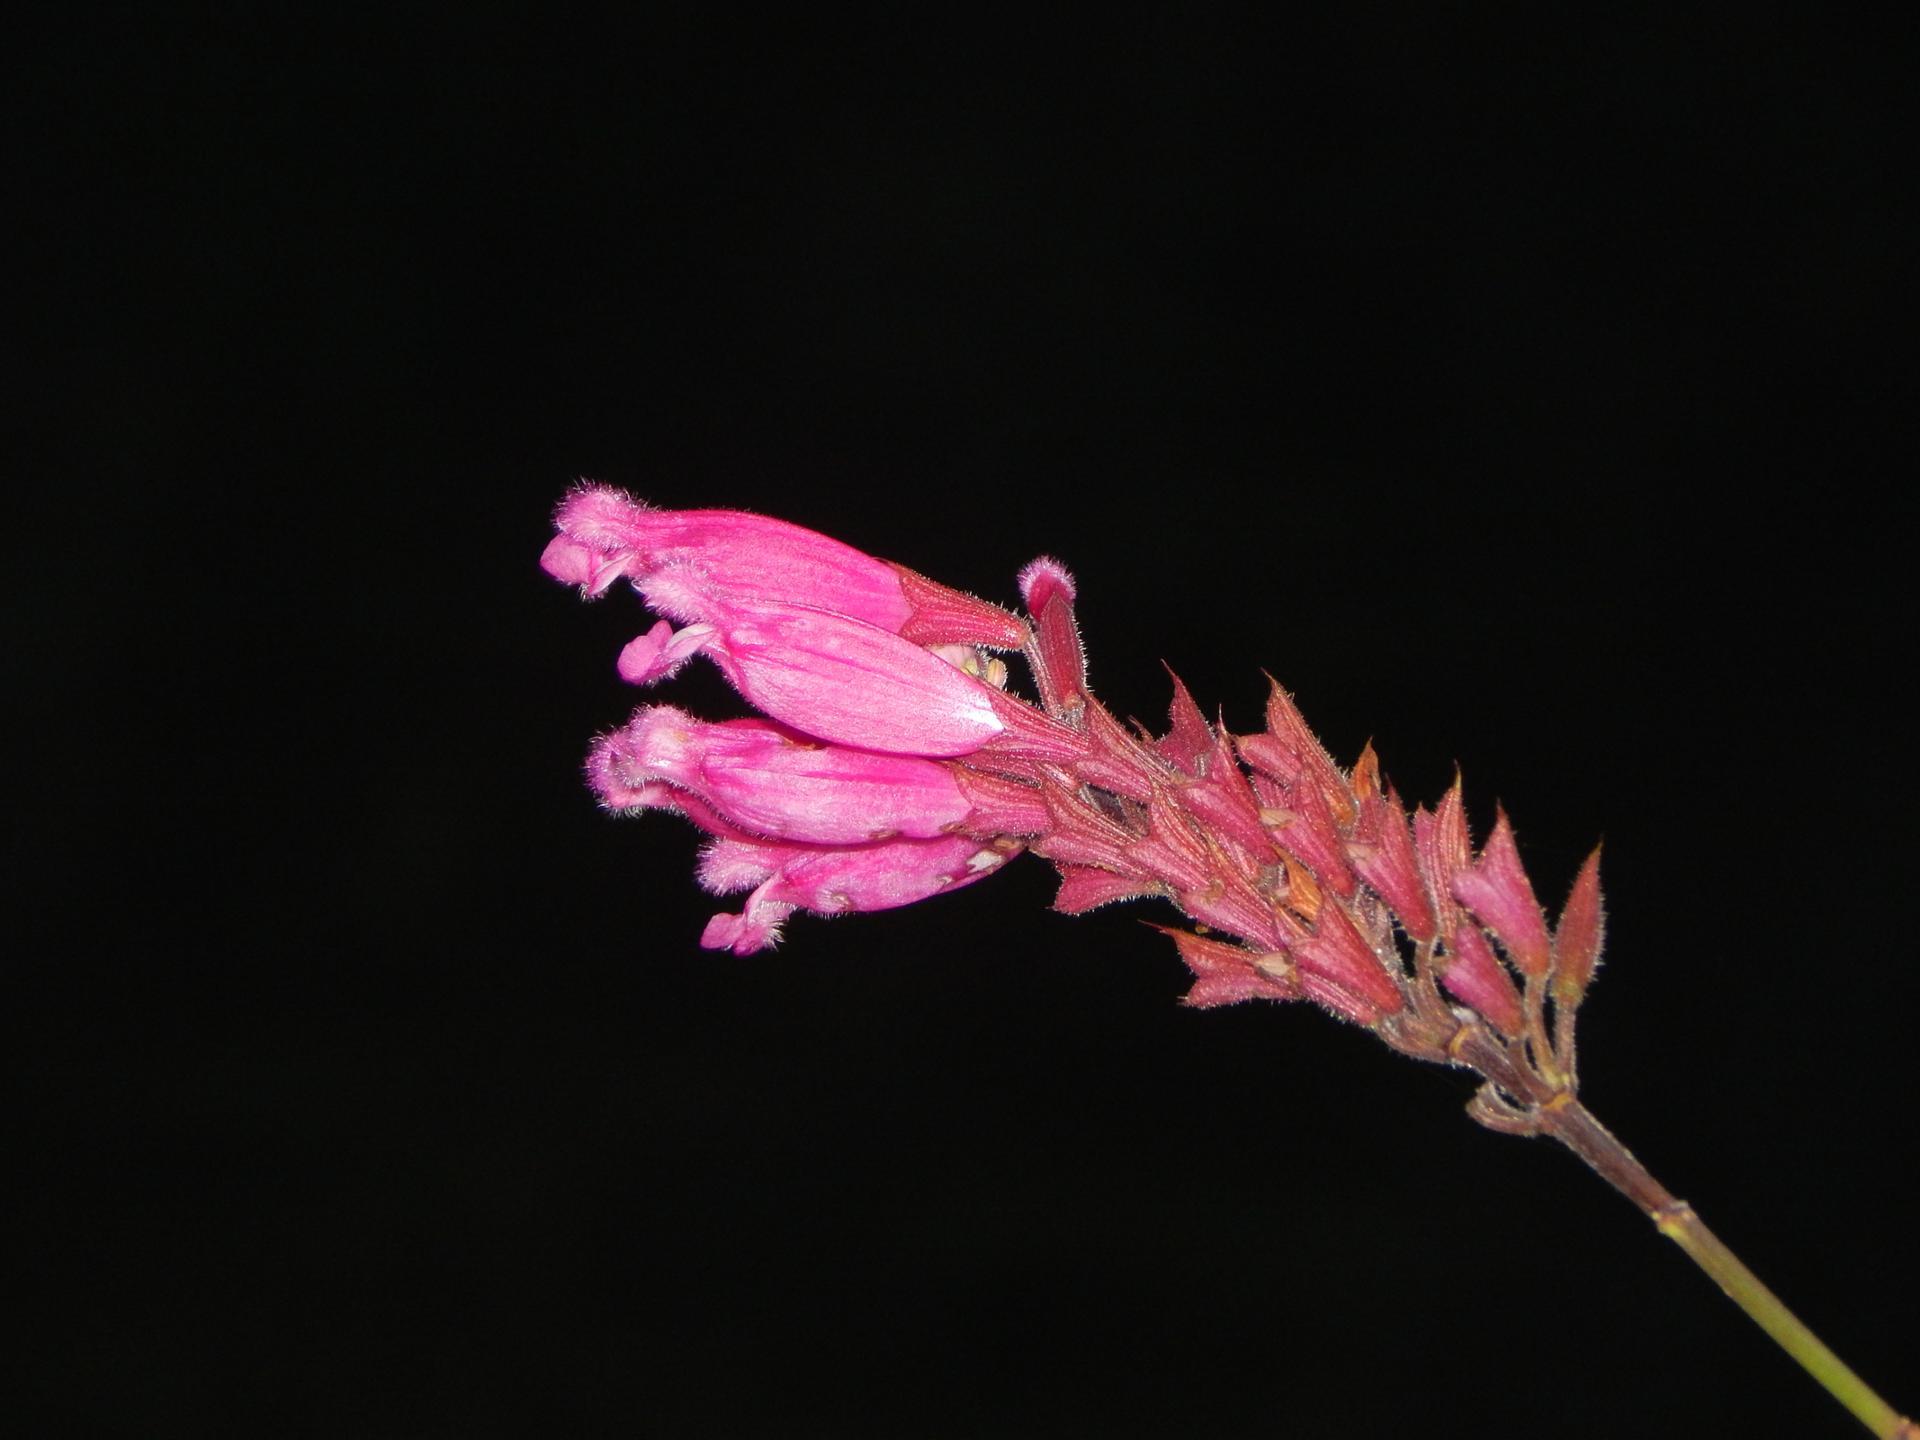 Nuit rose